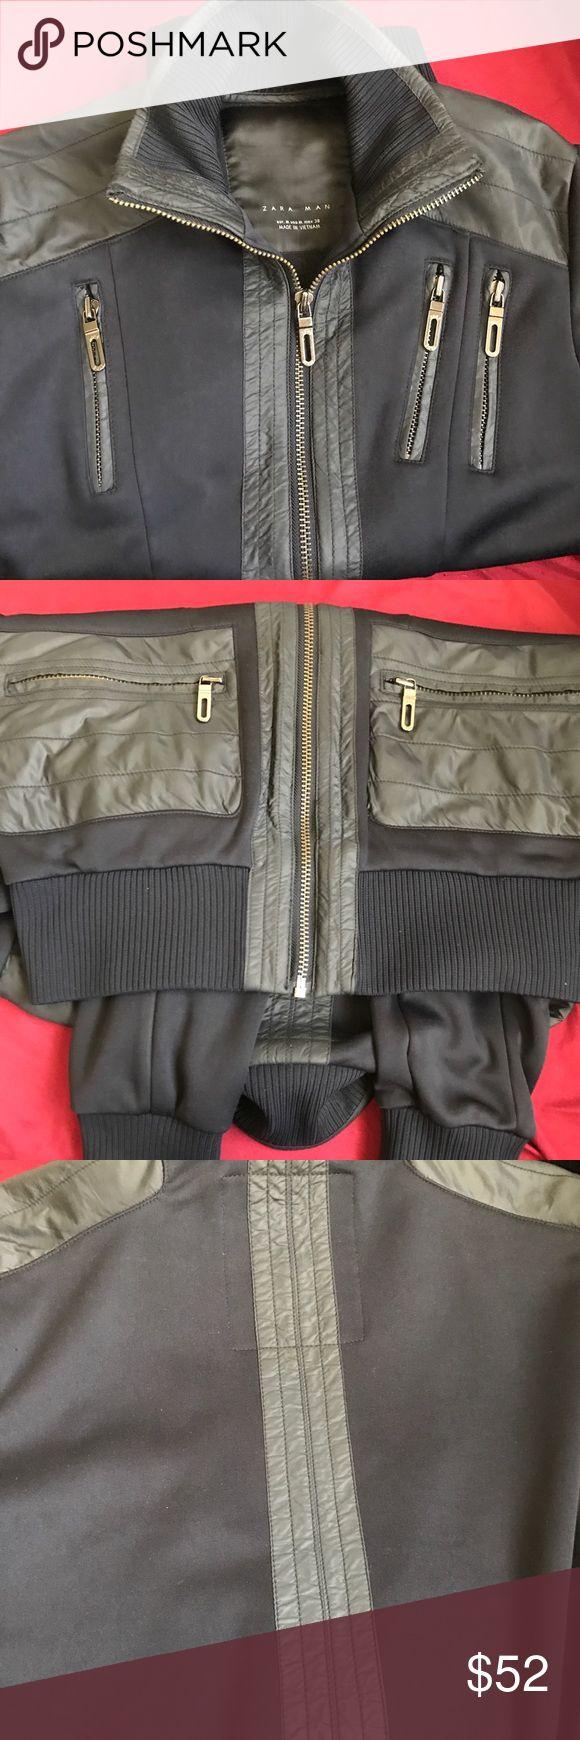 Zara Man Jacket Black Zara Man jacket size M 6 zippers polyester and nylon bomber jacket Zara Jackets & Coats Bomber & Varsity